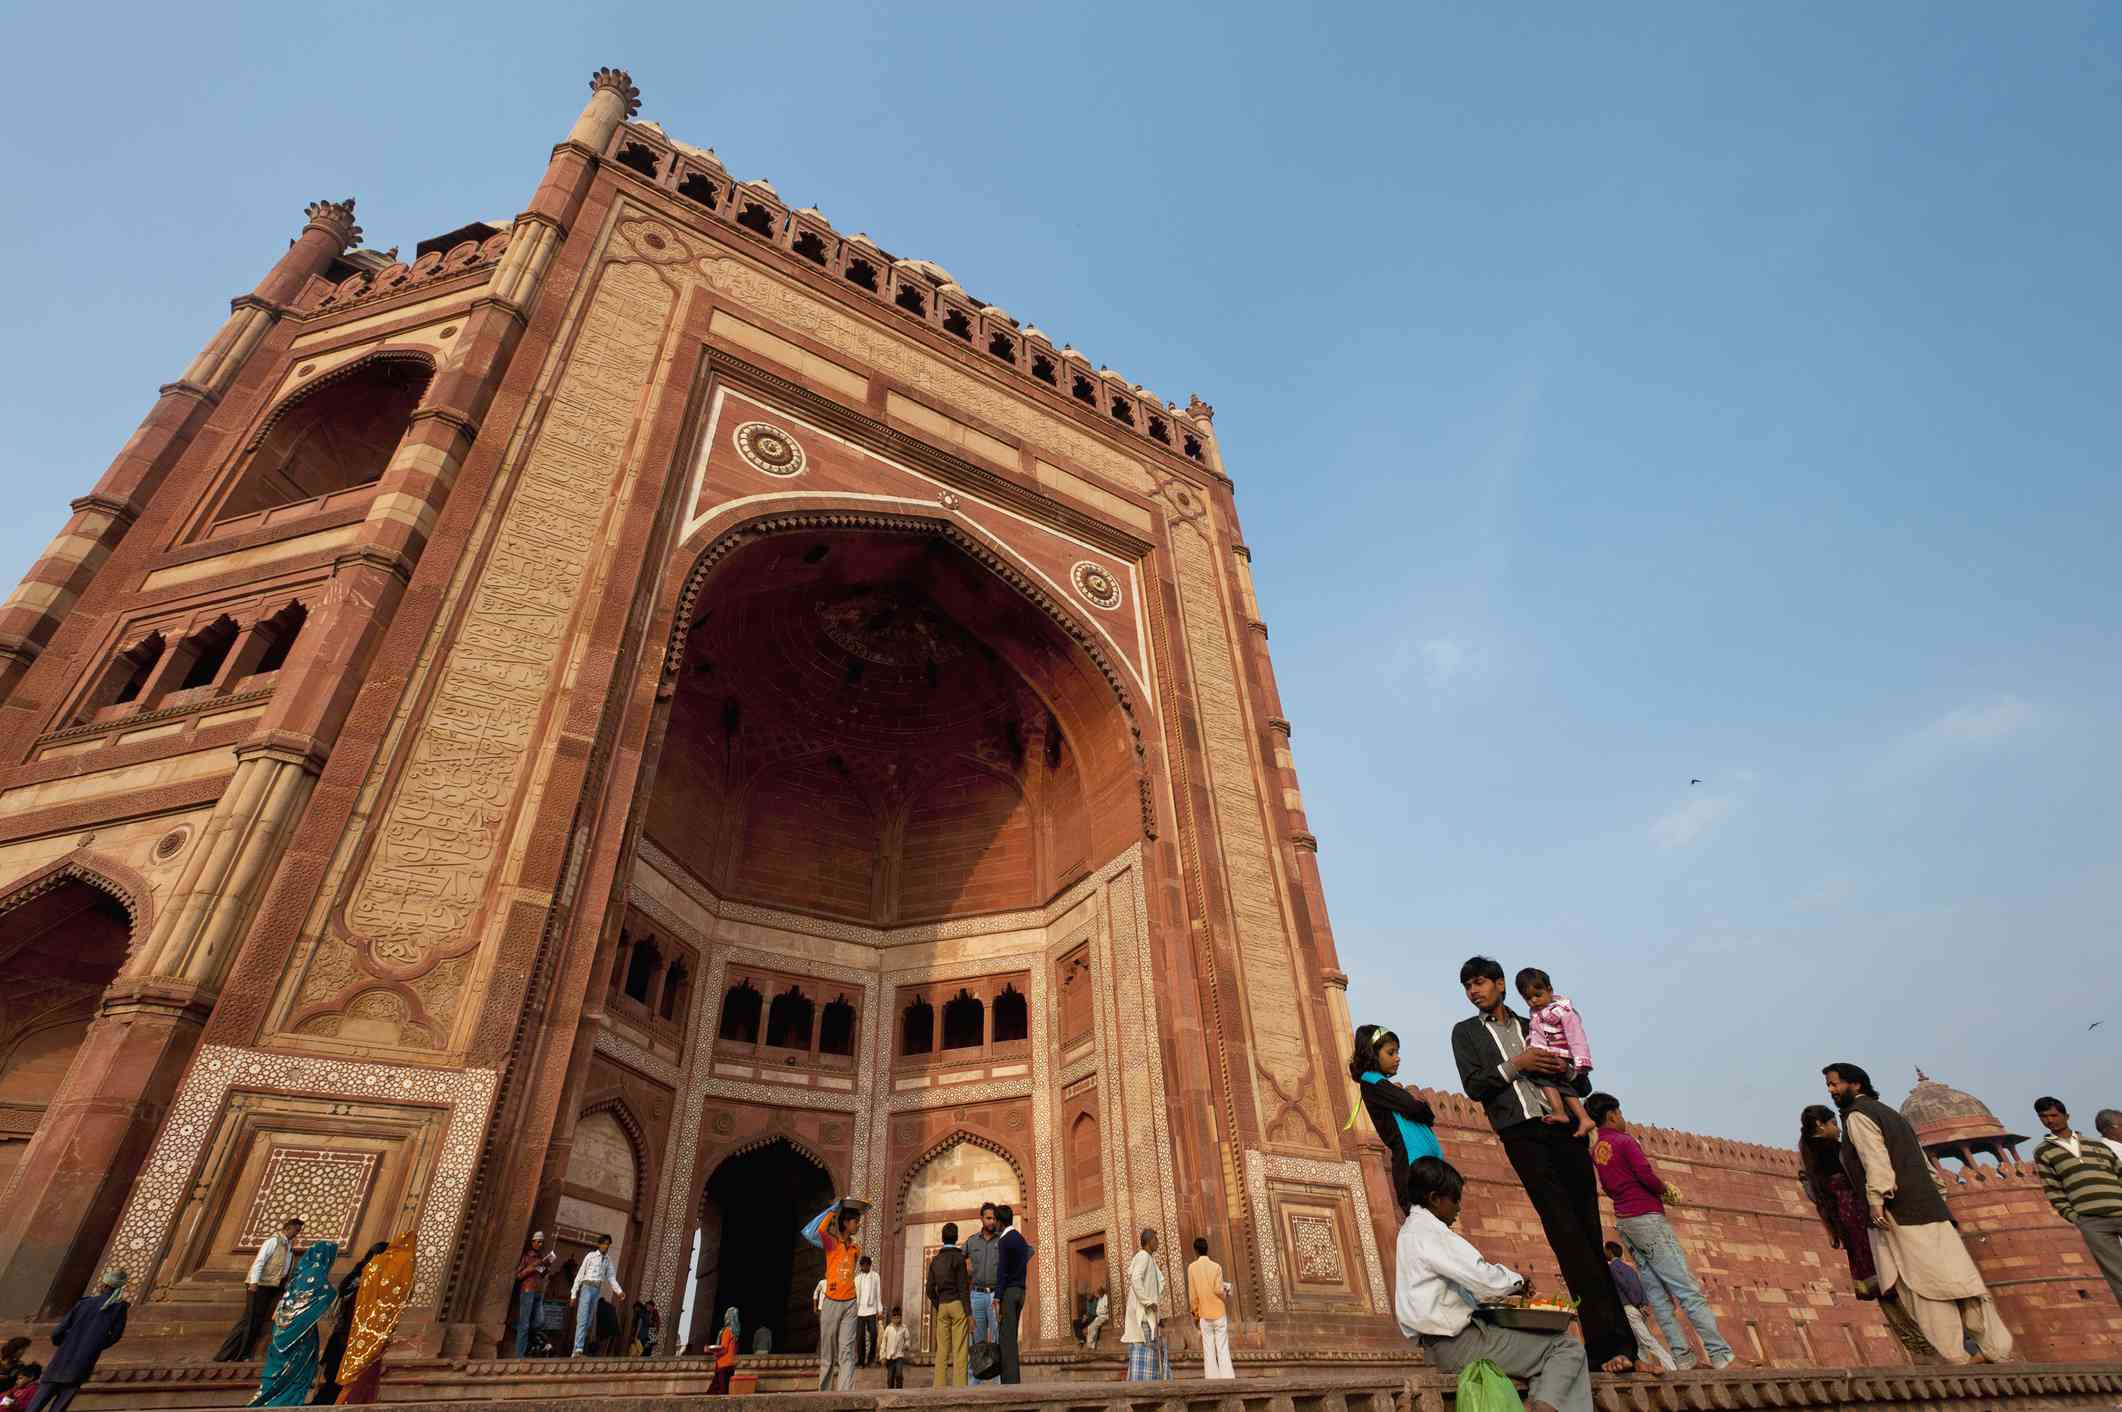 Fatehpur Sikri; Agra, Buland Darwaza (Great Gate) of Jami Masjid